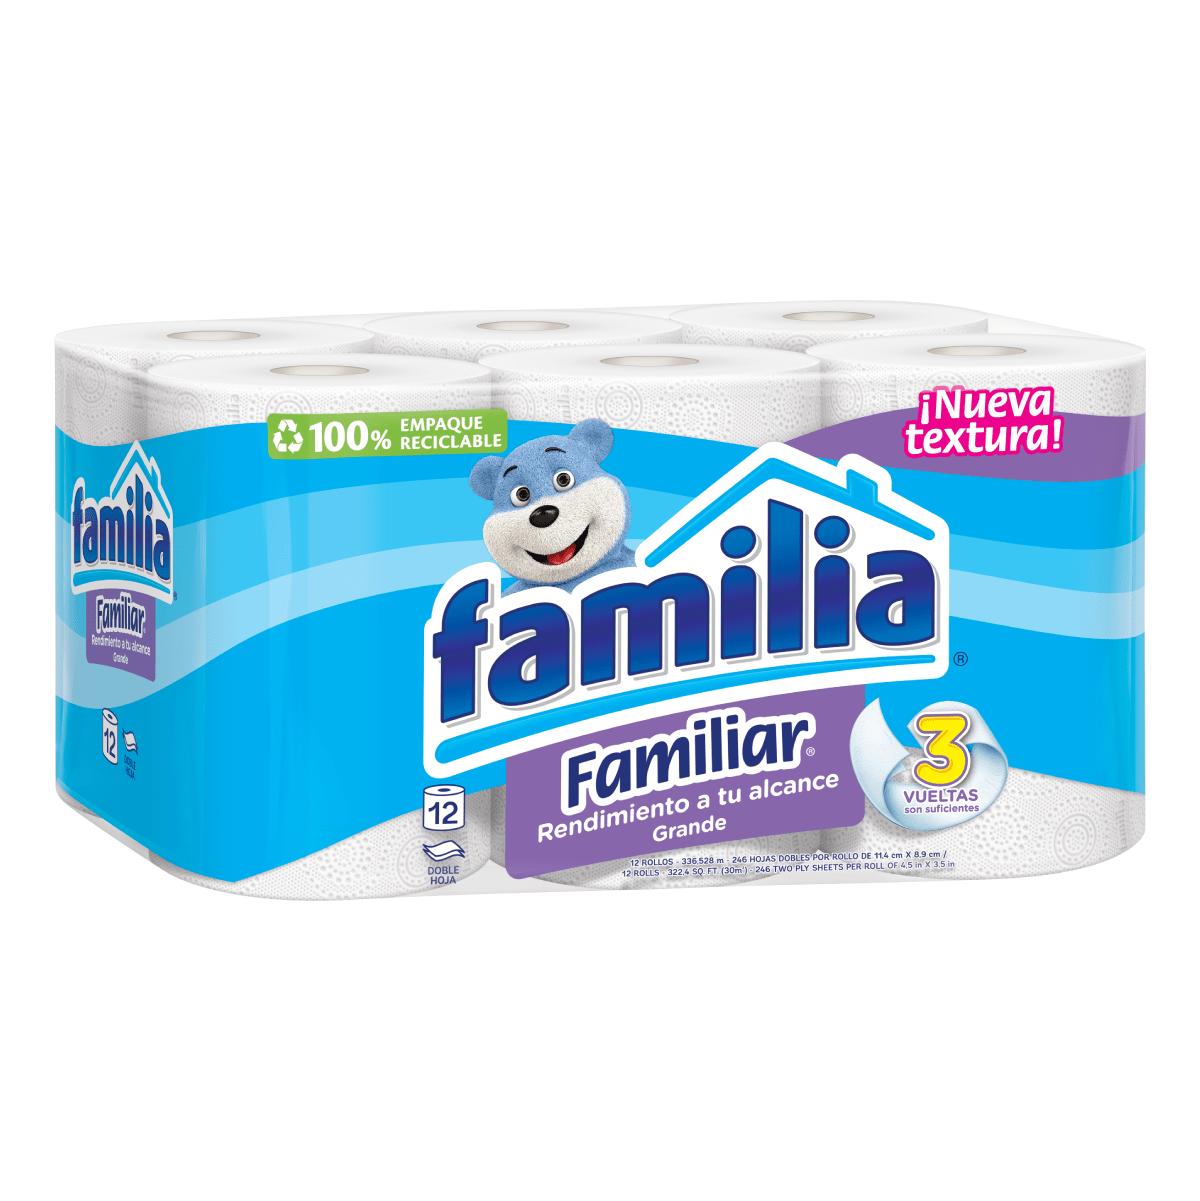 Imagen Papel Higiénico Familia Familiar X 12 Rollos